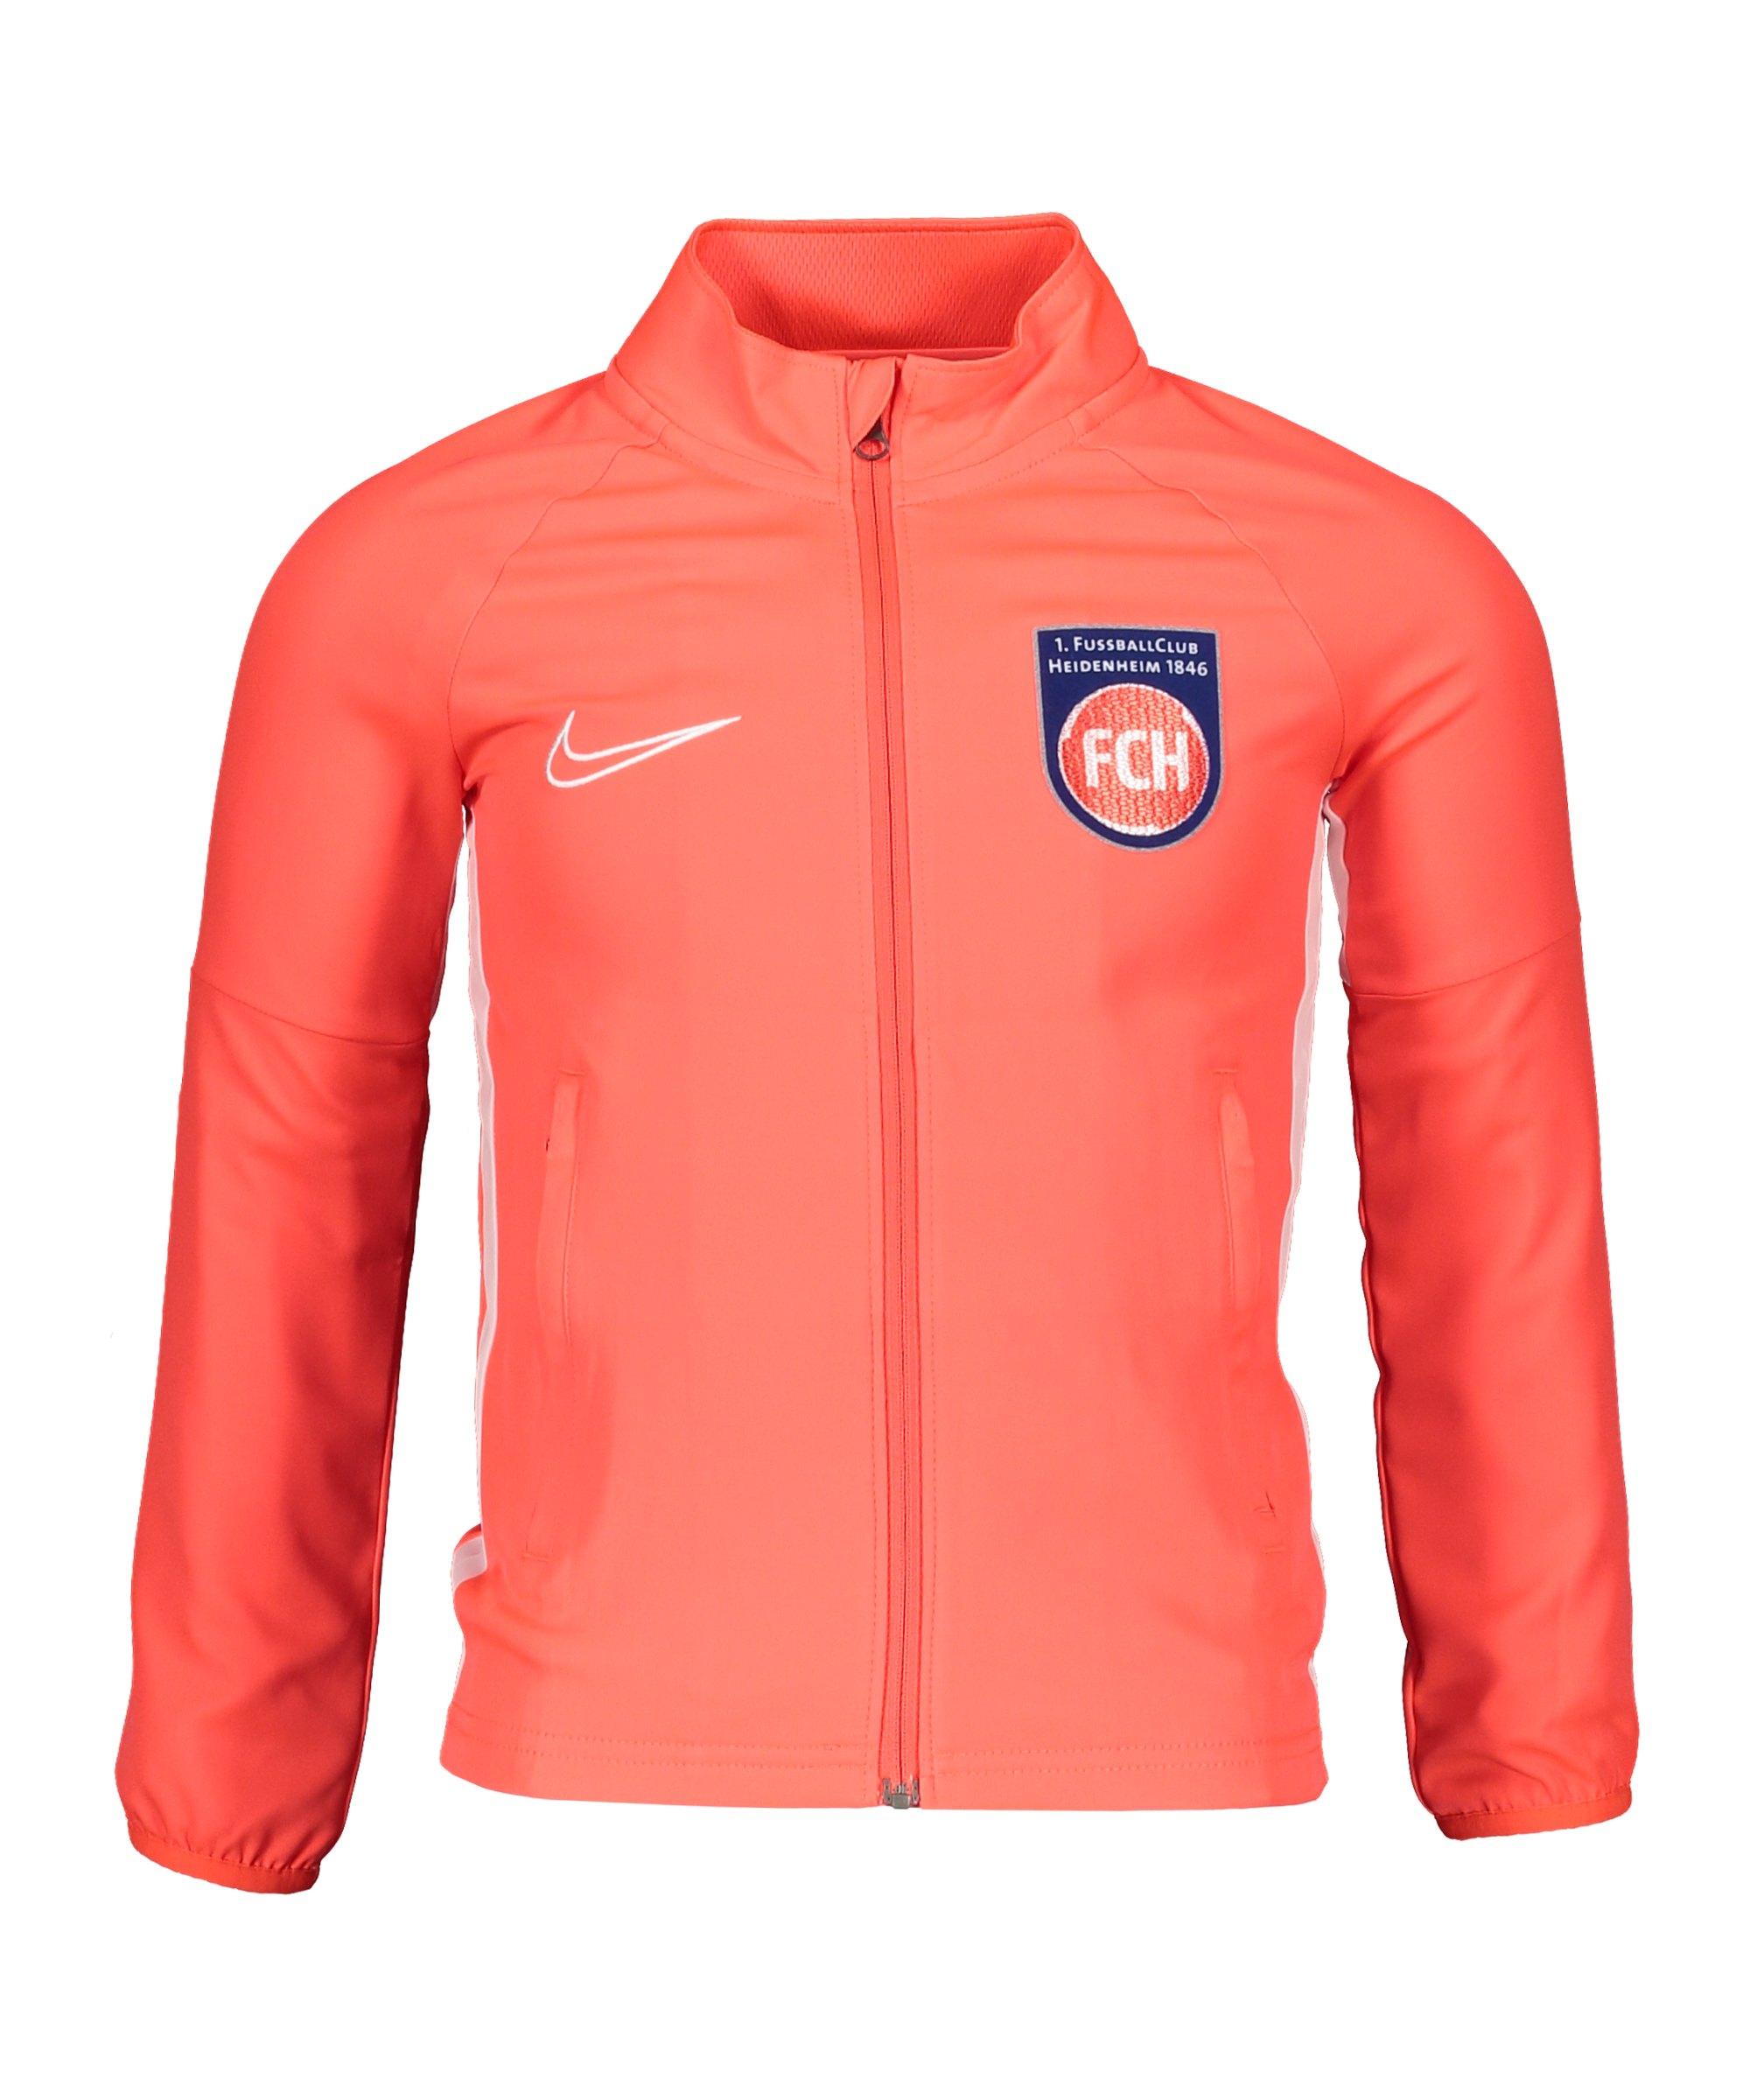 Nike 1. FC Heidenheim Trainingsjacke Kids Rot F671 - rot